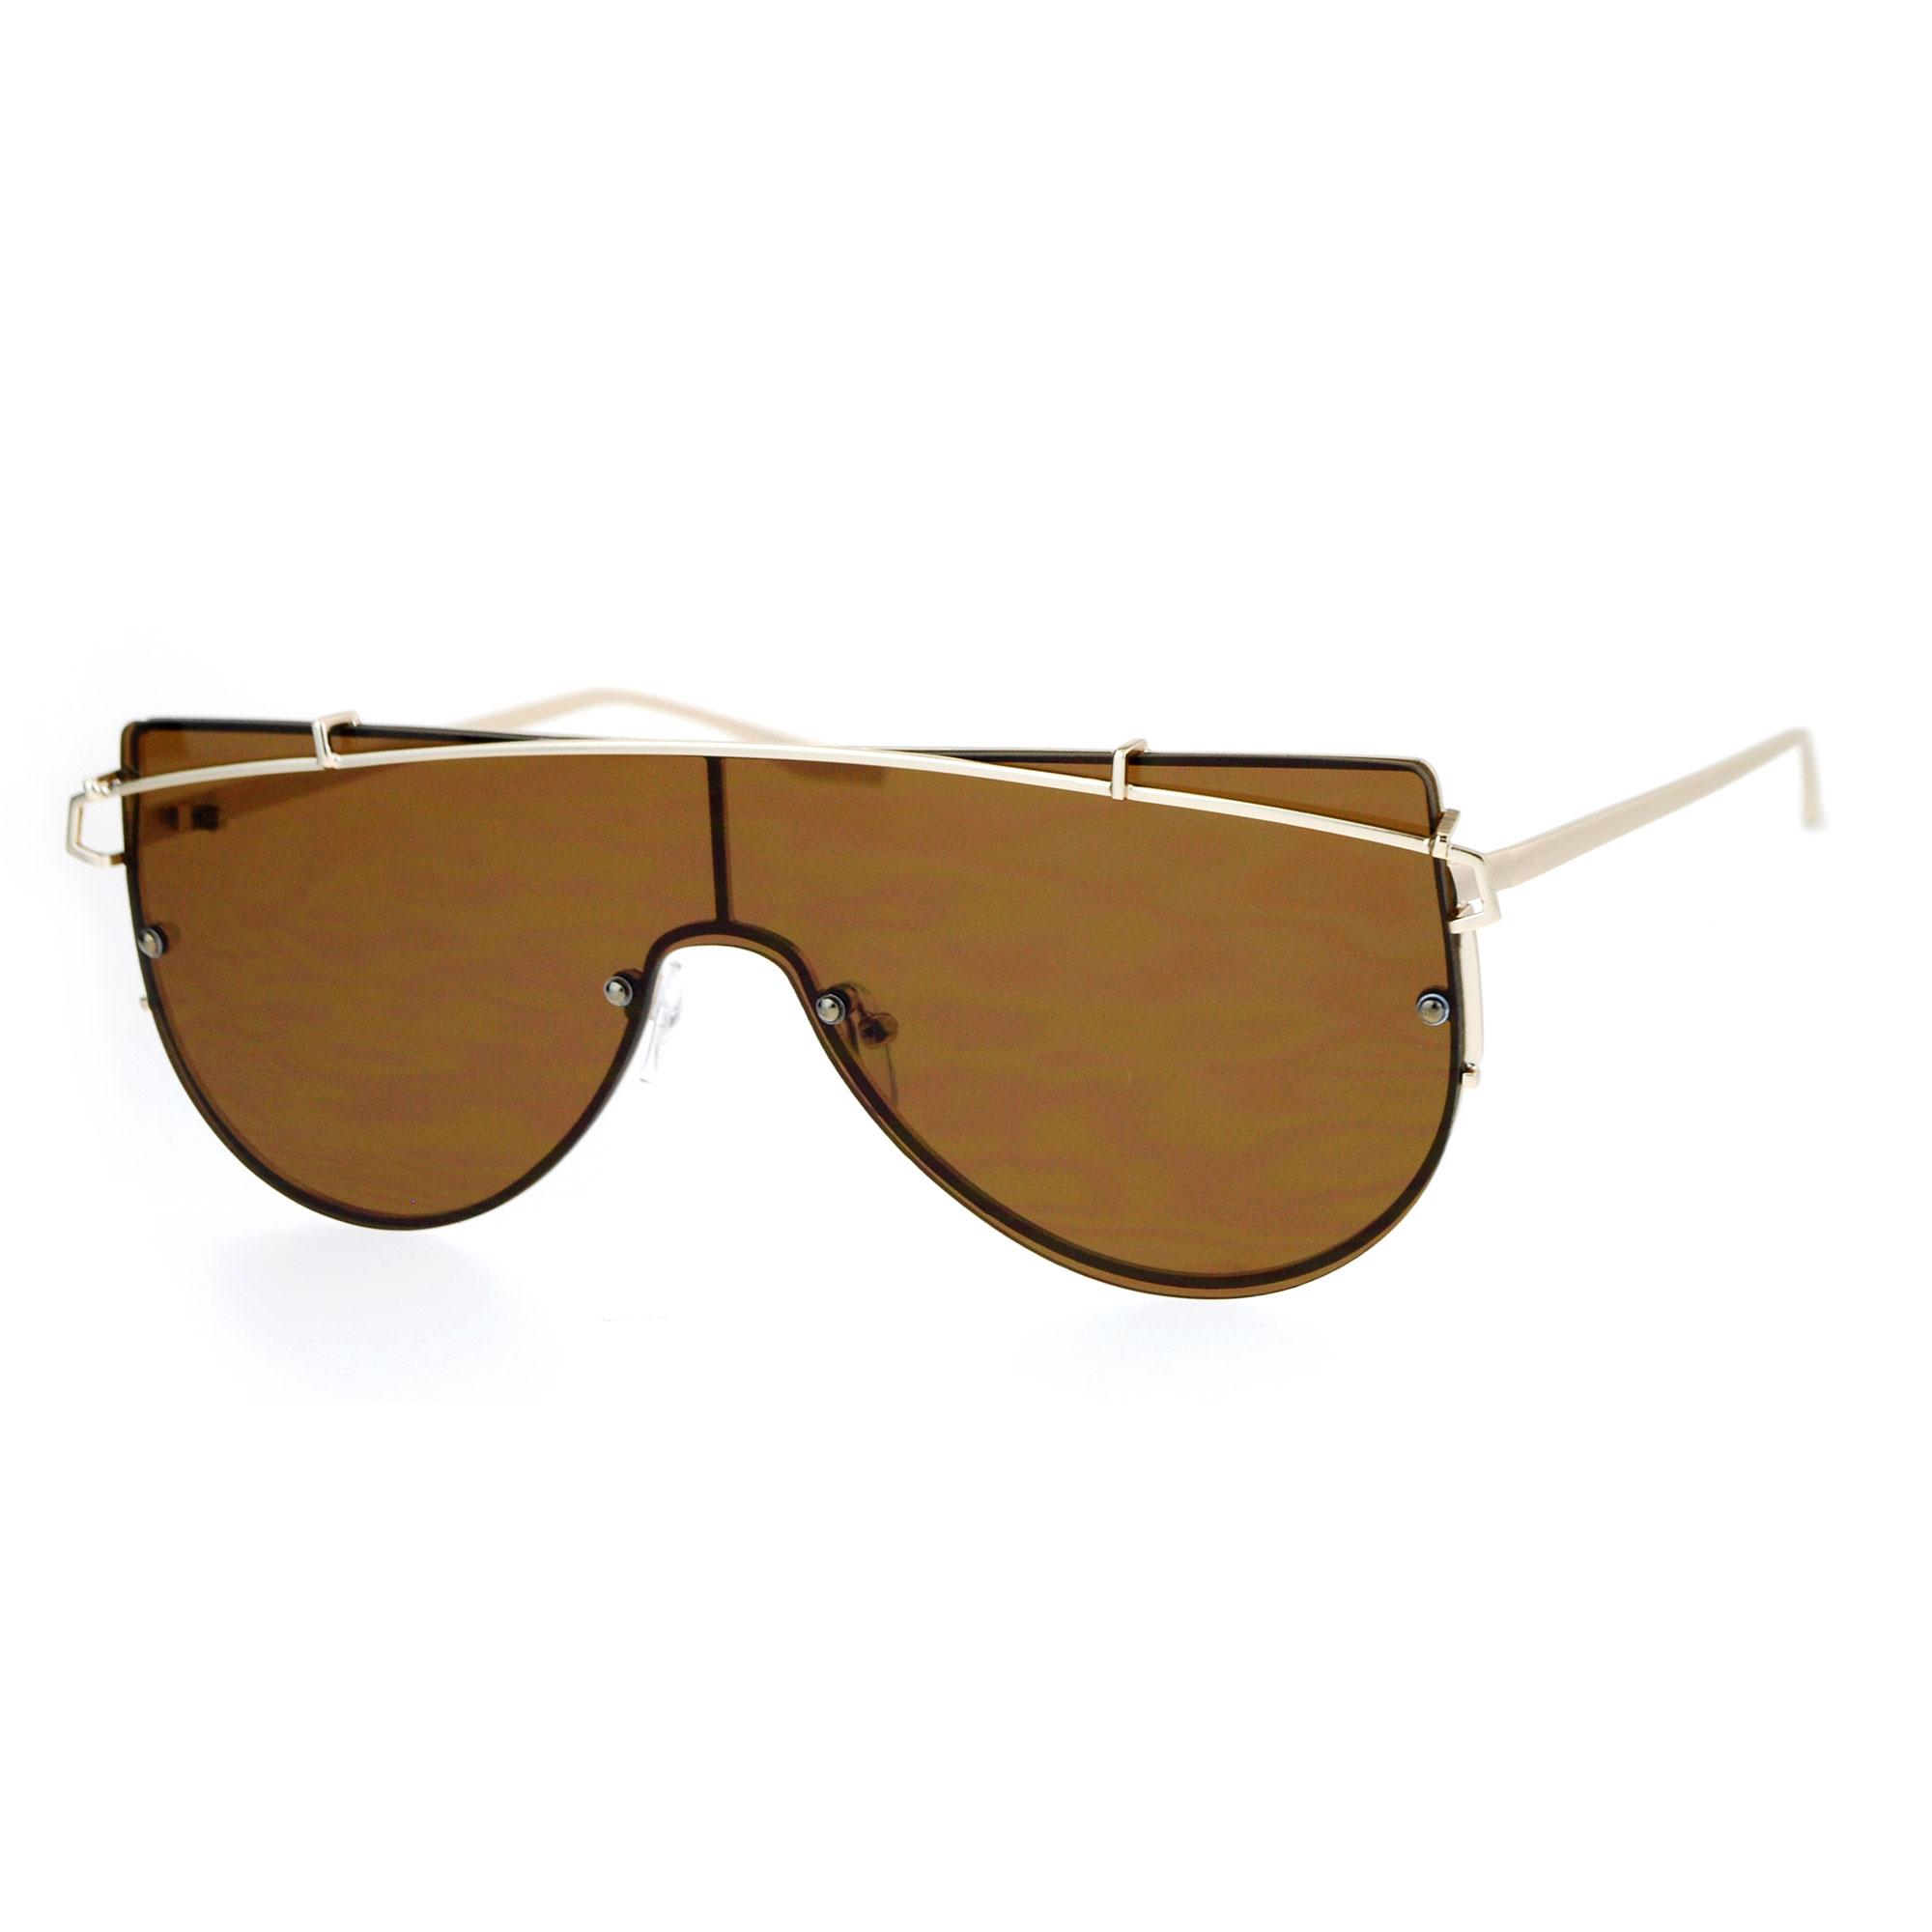 Large womens fashion oversized round circle sunglasses ebay - Sa106 Flat Panel Shield Metal Brow Futurism Retro